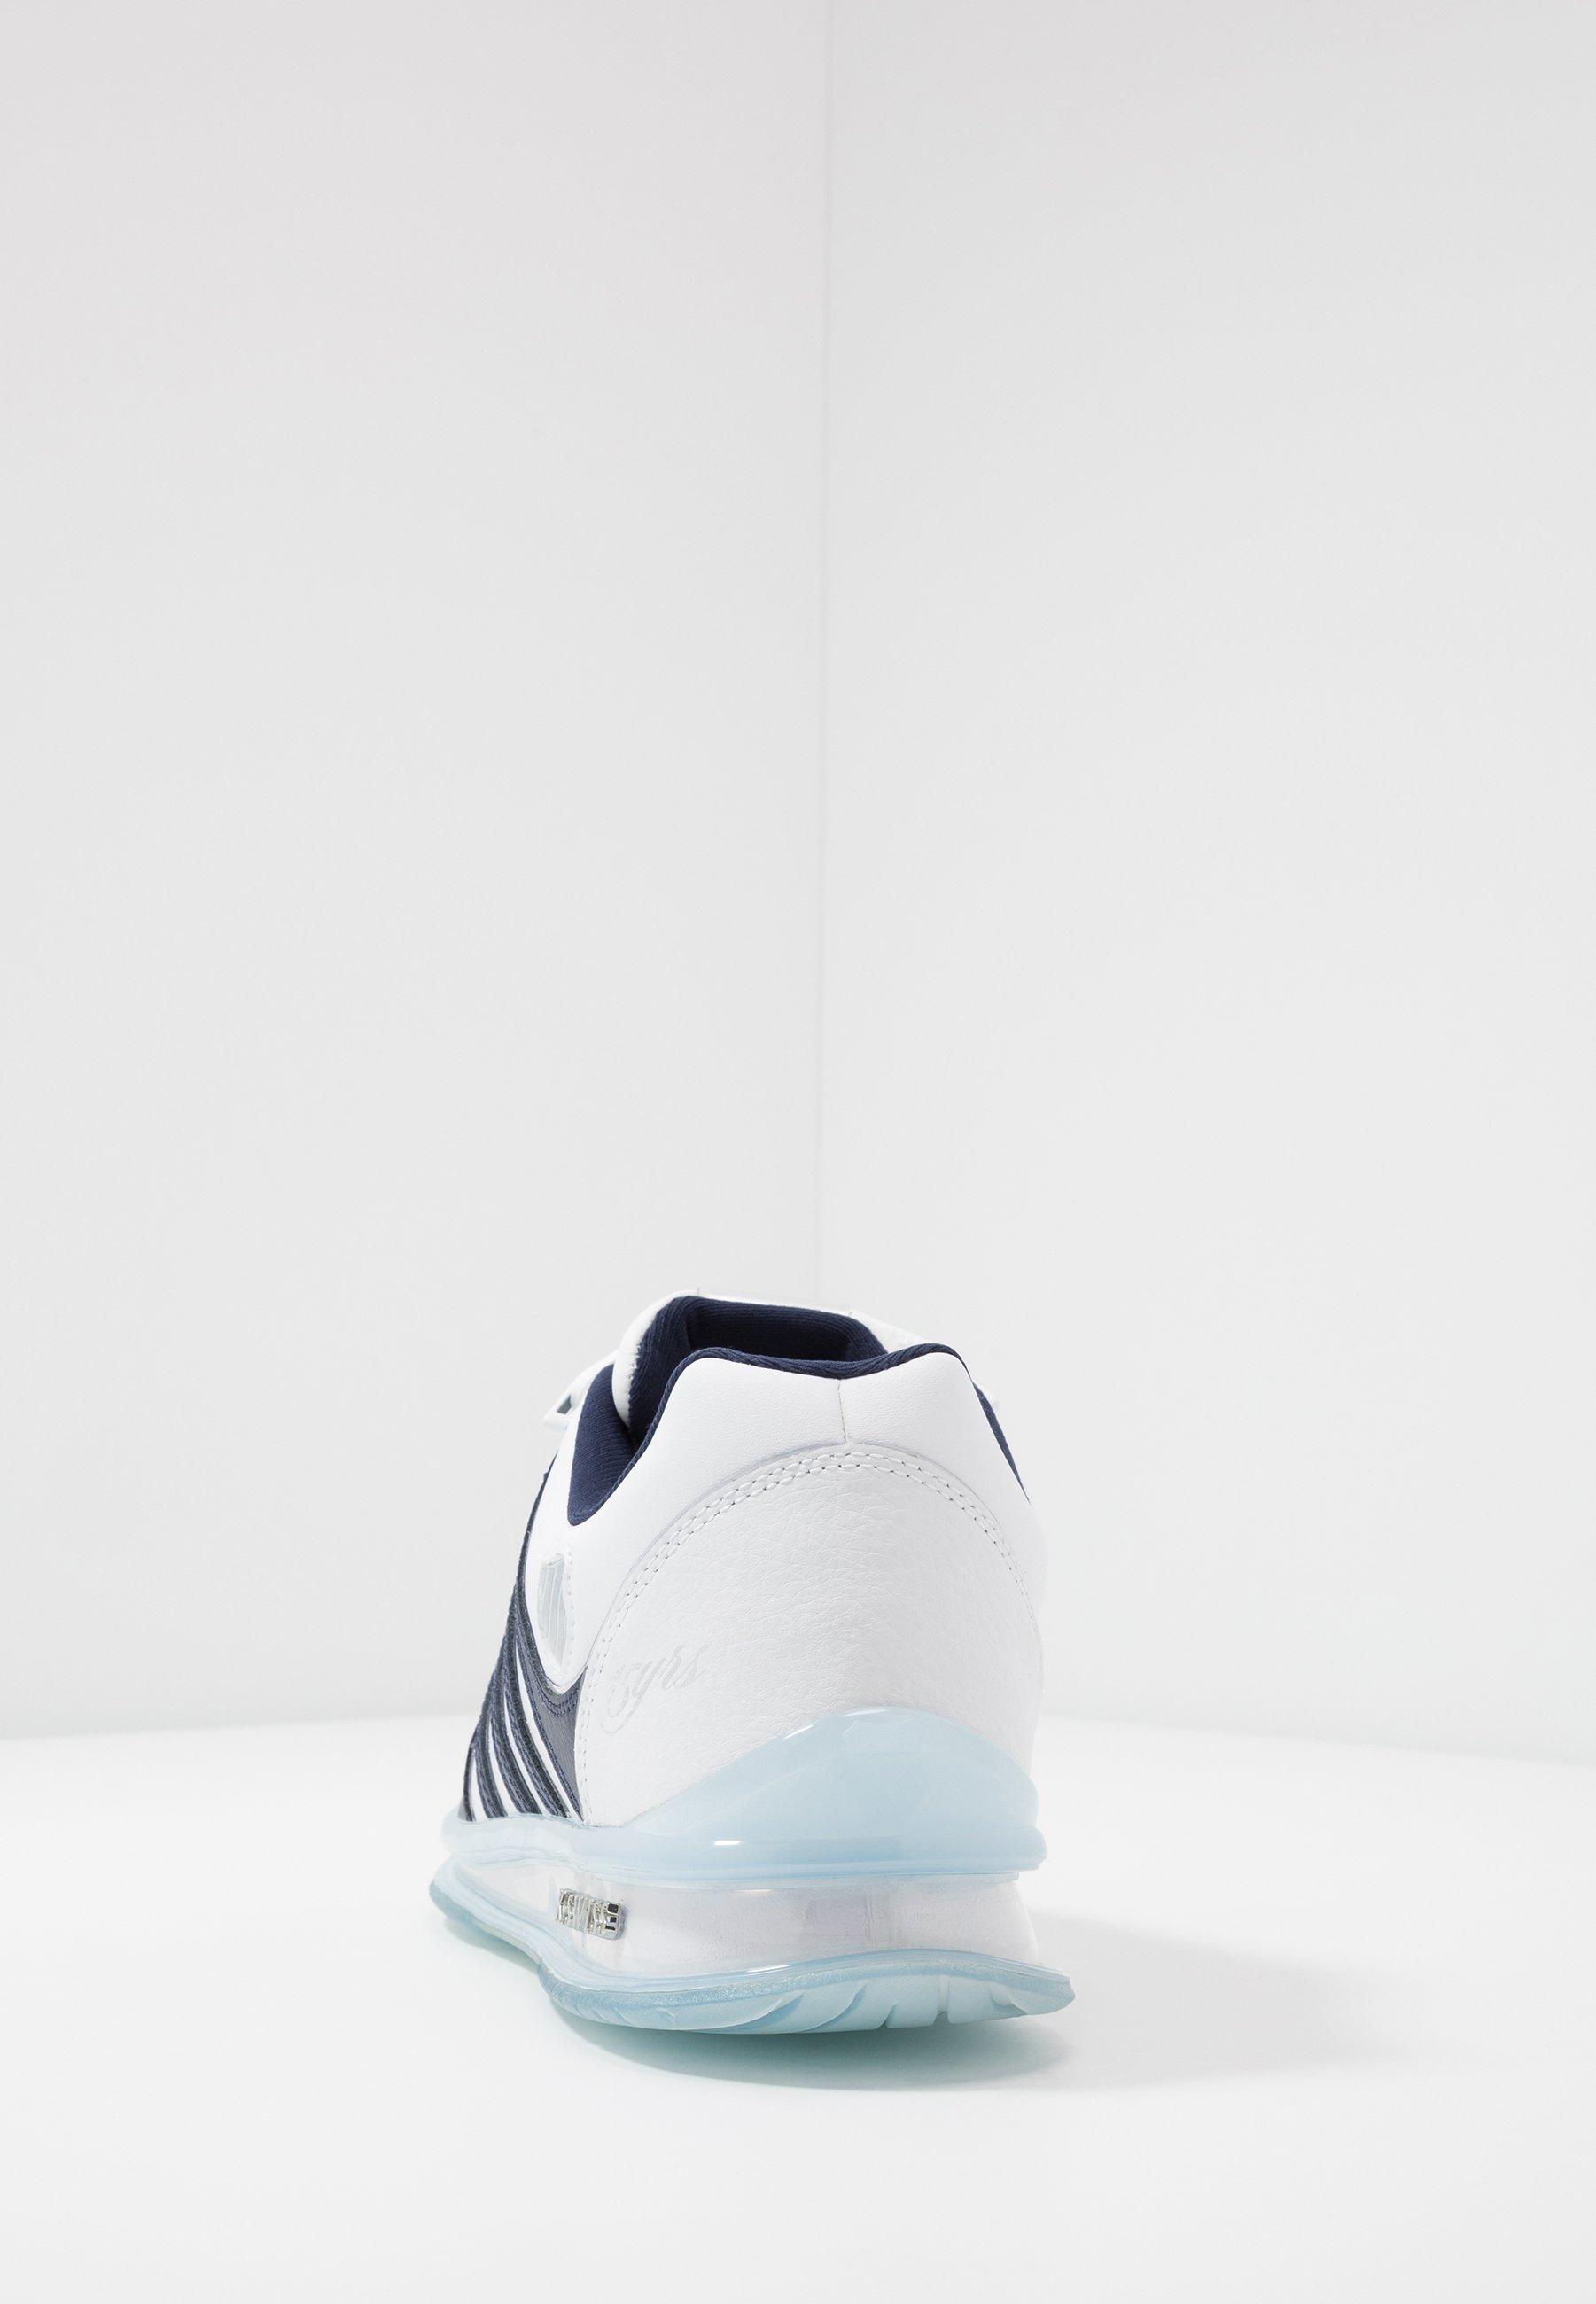 K-swiss Rinzler 15 Yrs - Baskets Basses White/navy/crystal Clear